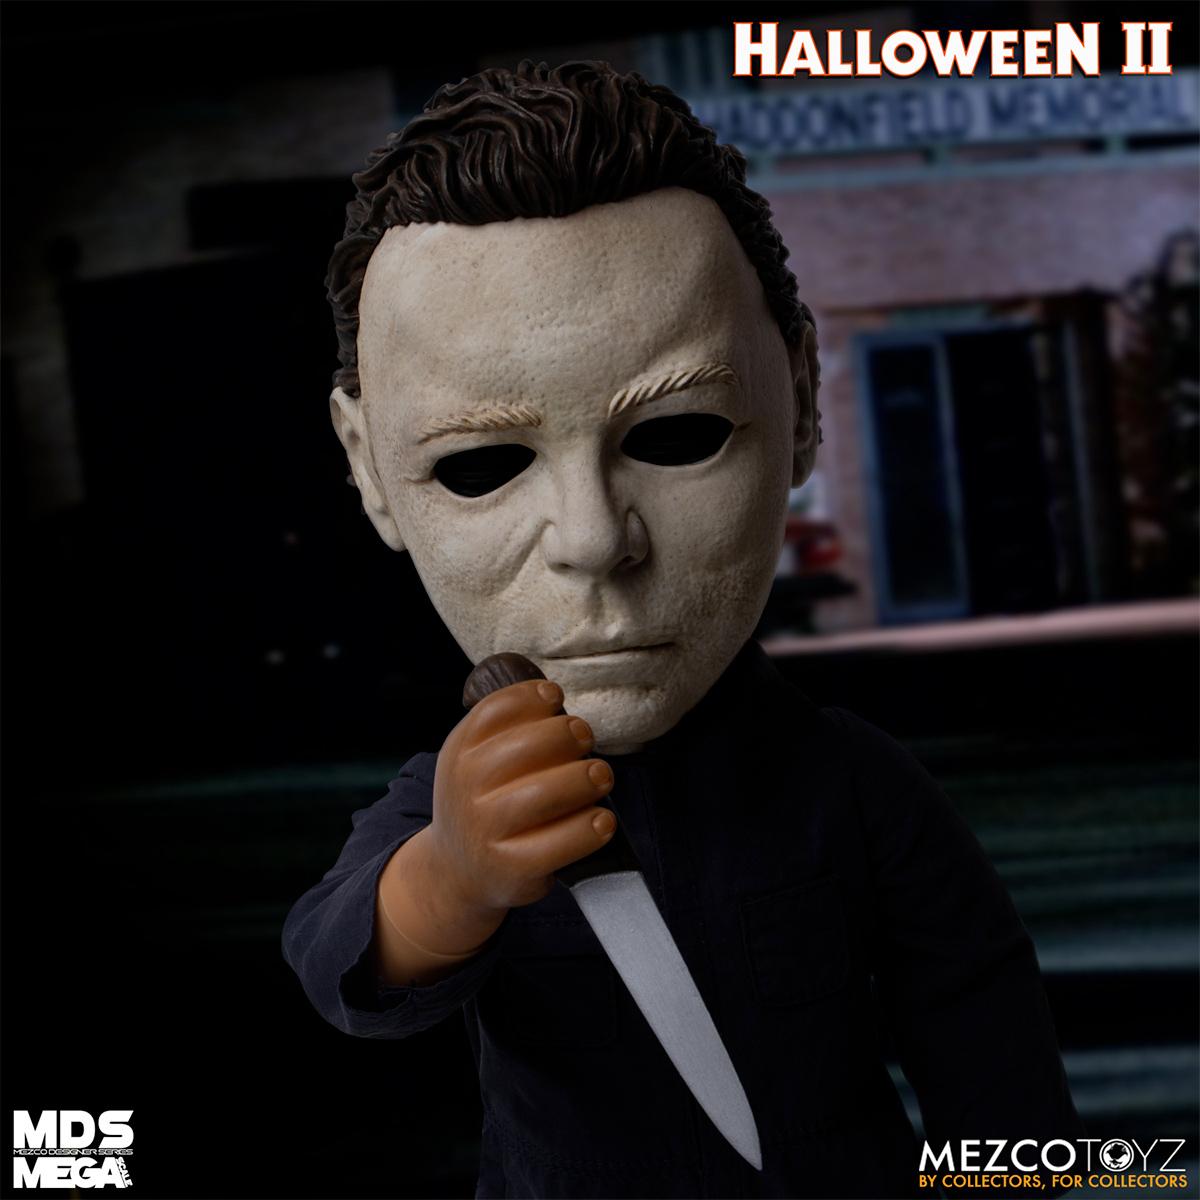 Boneco Halloween II Michael Myers with Sound MDS Mega Scale Doll